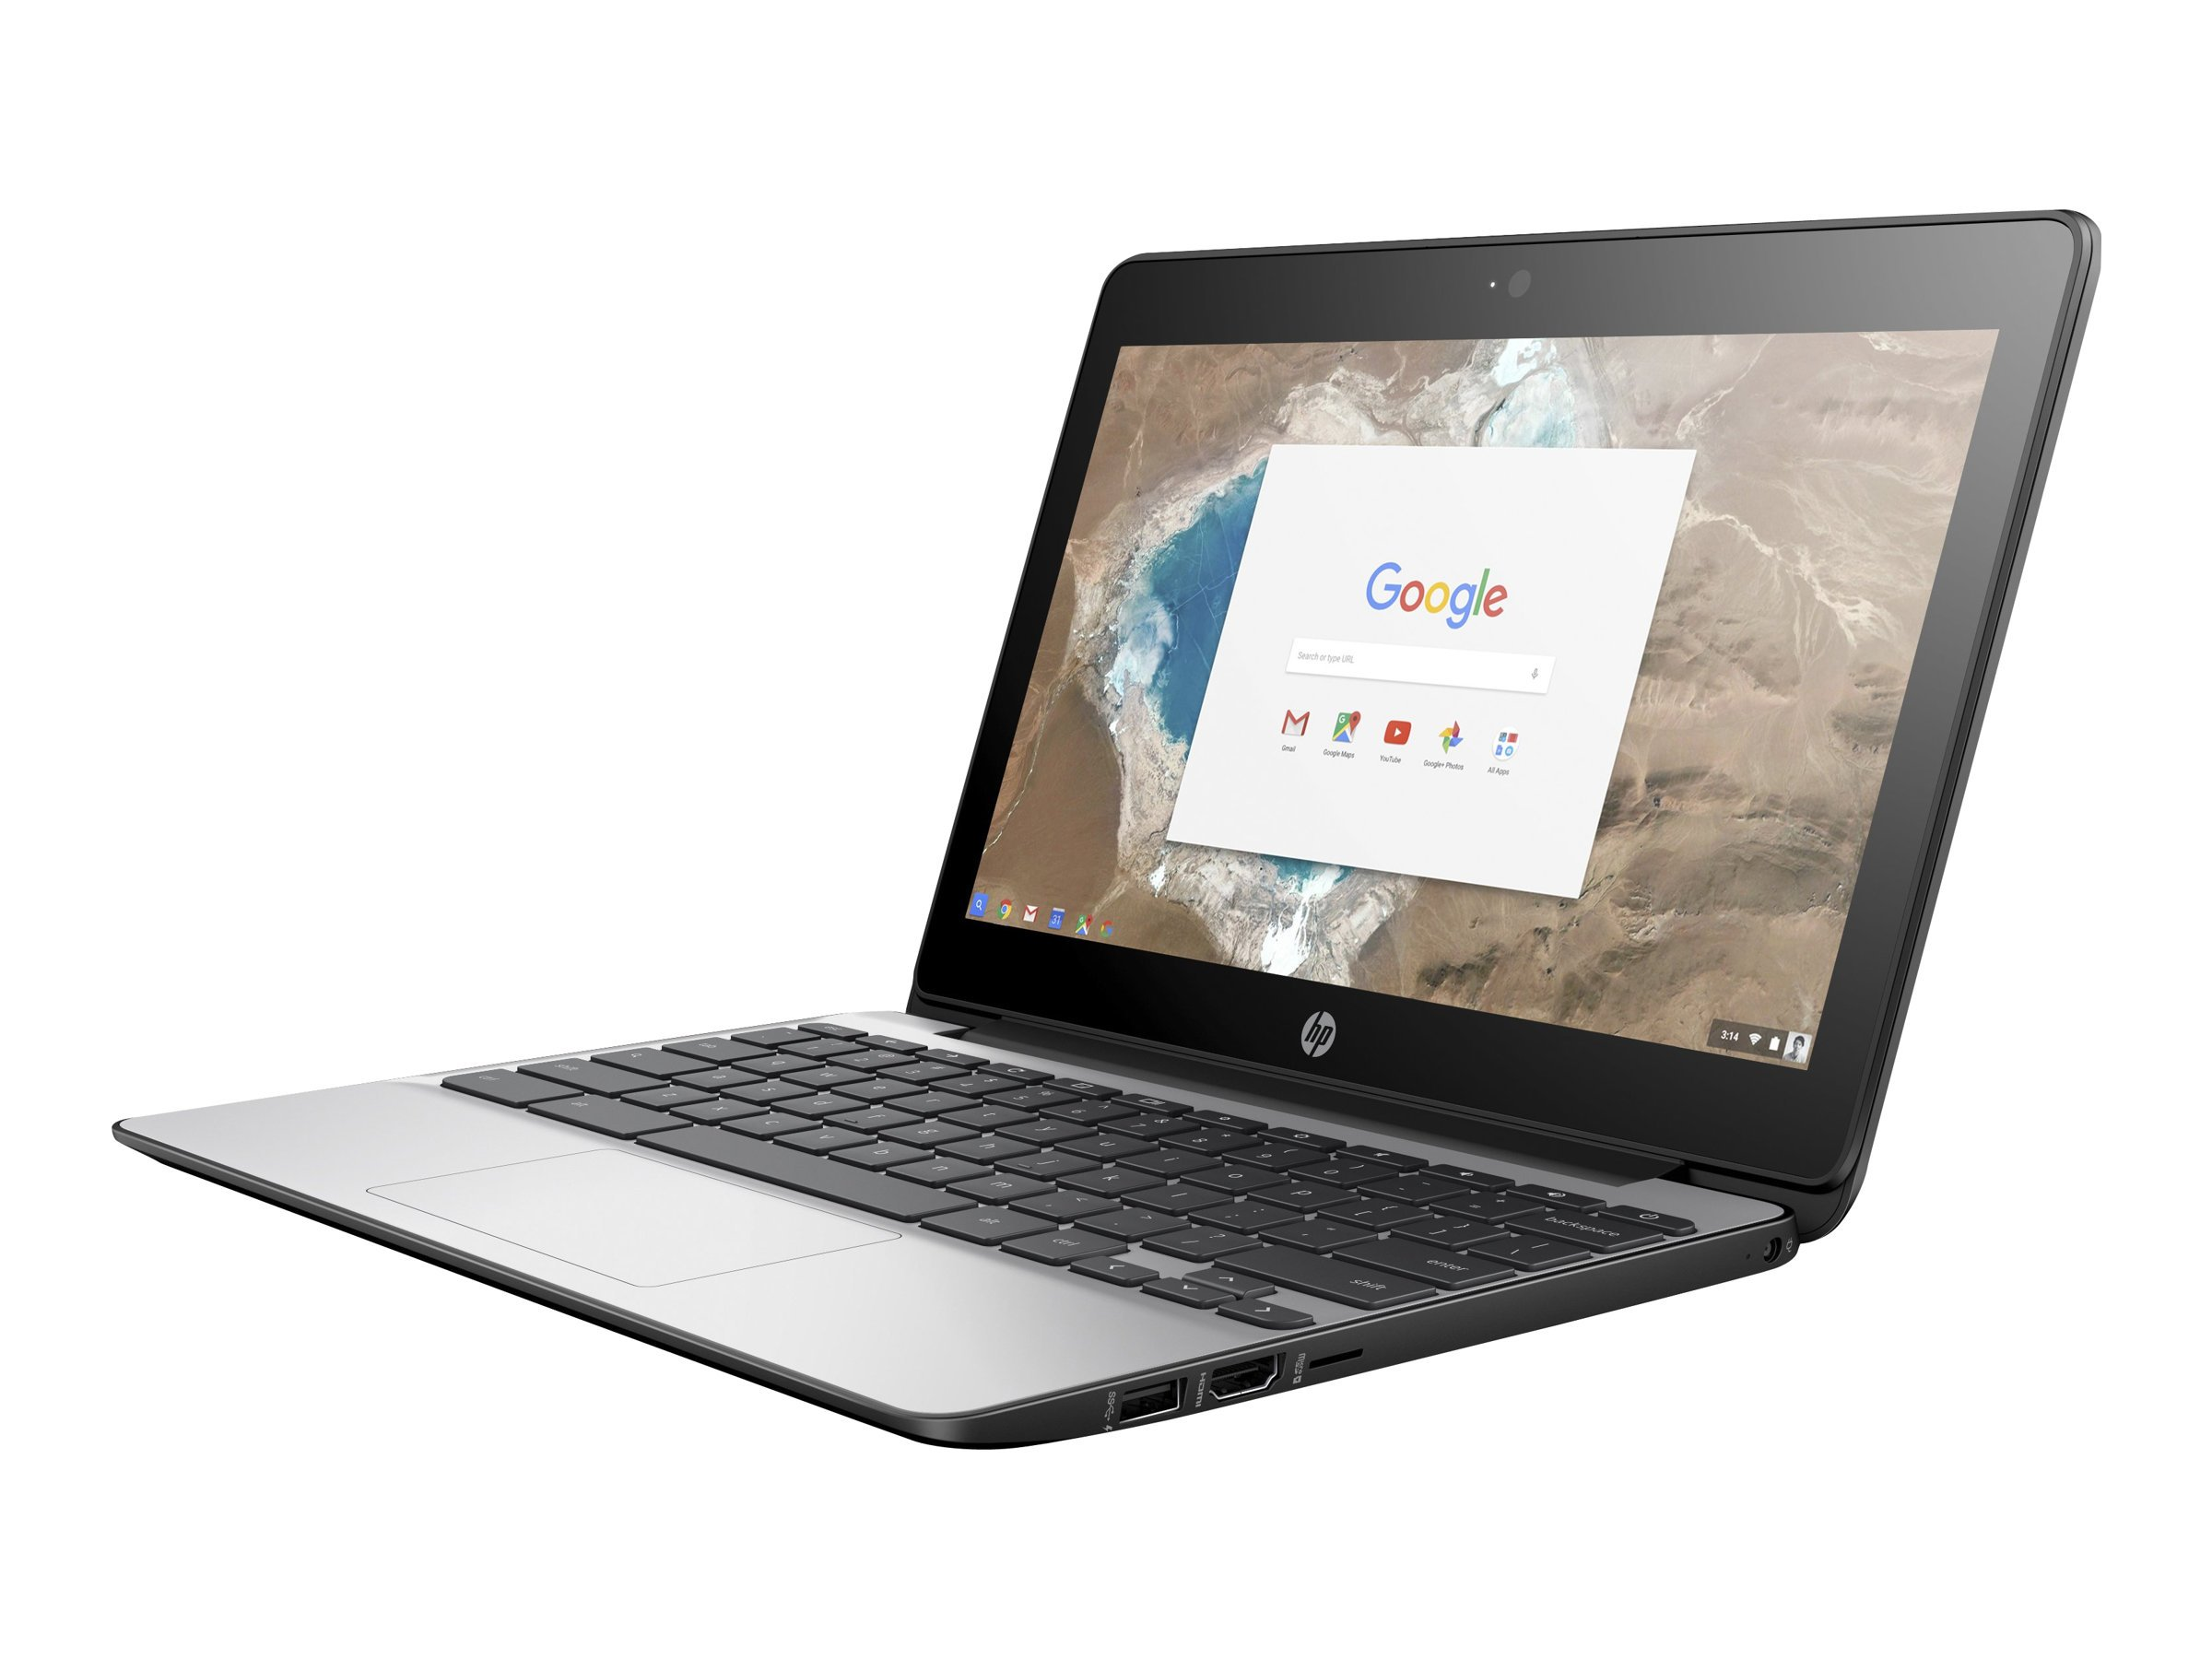 HP Chromebook 11 G5 11.6'' Chromebook - Intel Celeron N3050 Dual-core (2 Core) 1.60 GHz